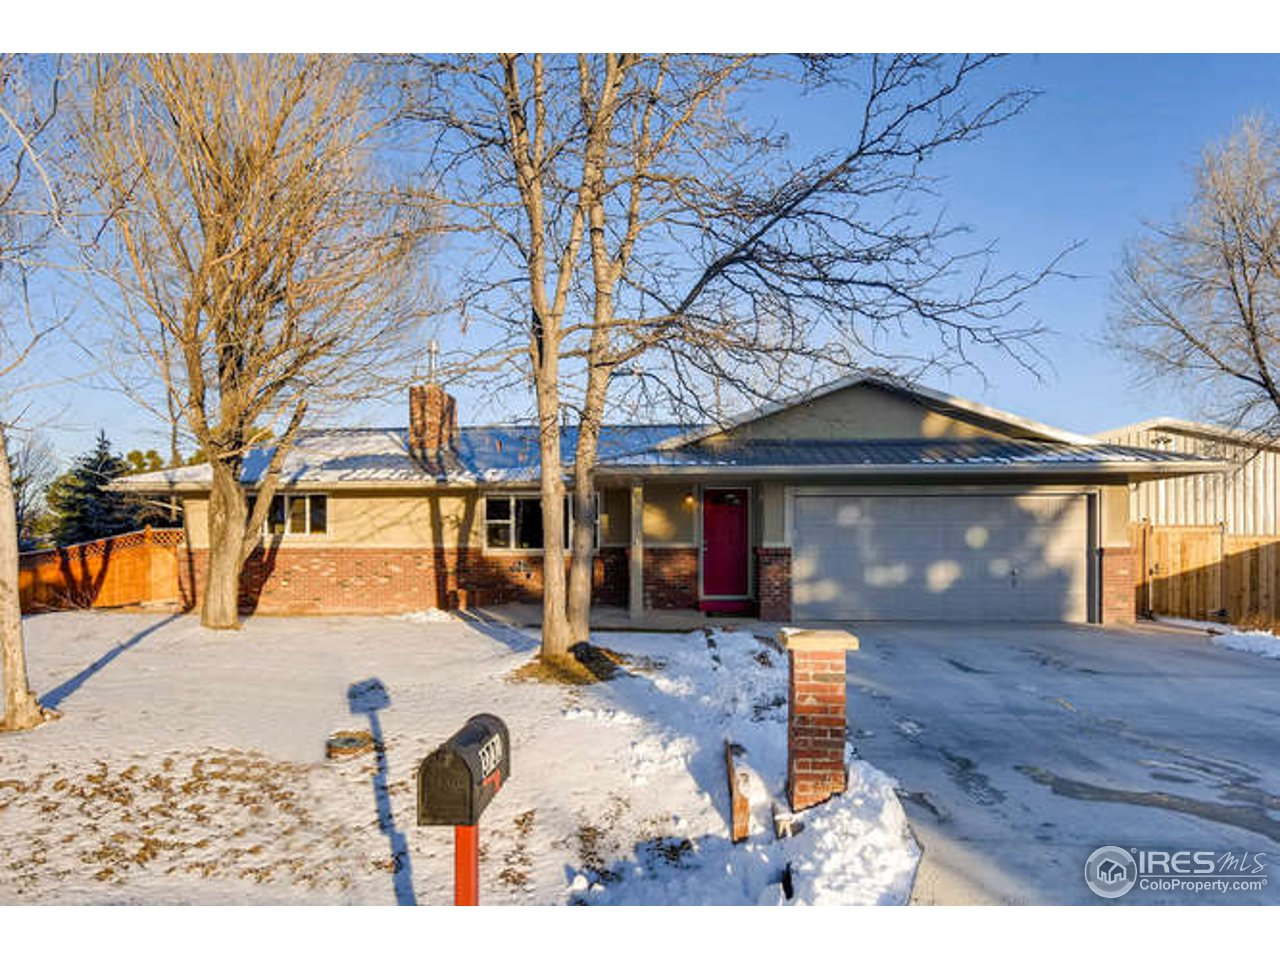 3732 Crescent Dr, Fort Collins CO 80526